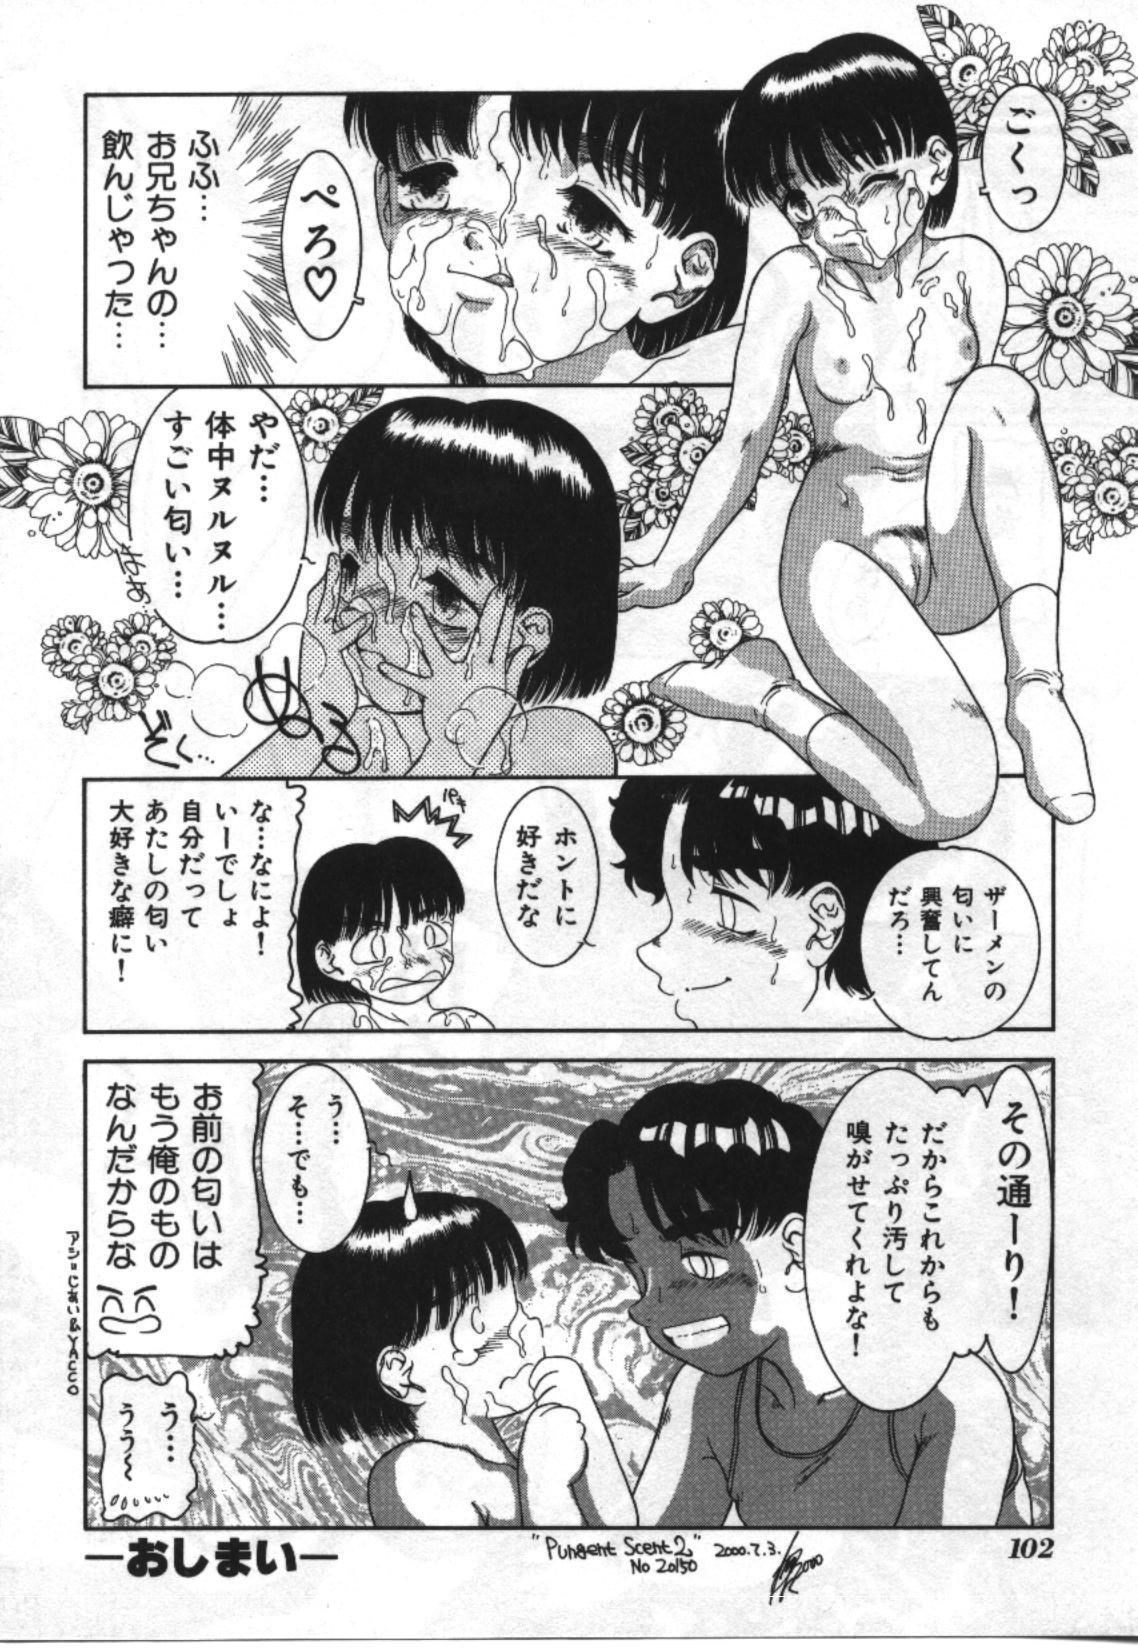 Imouto Koishi 2 101